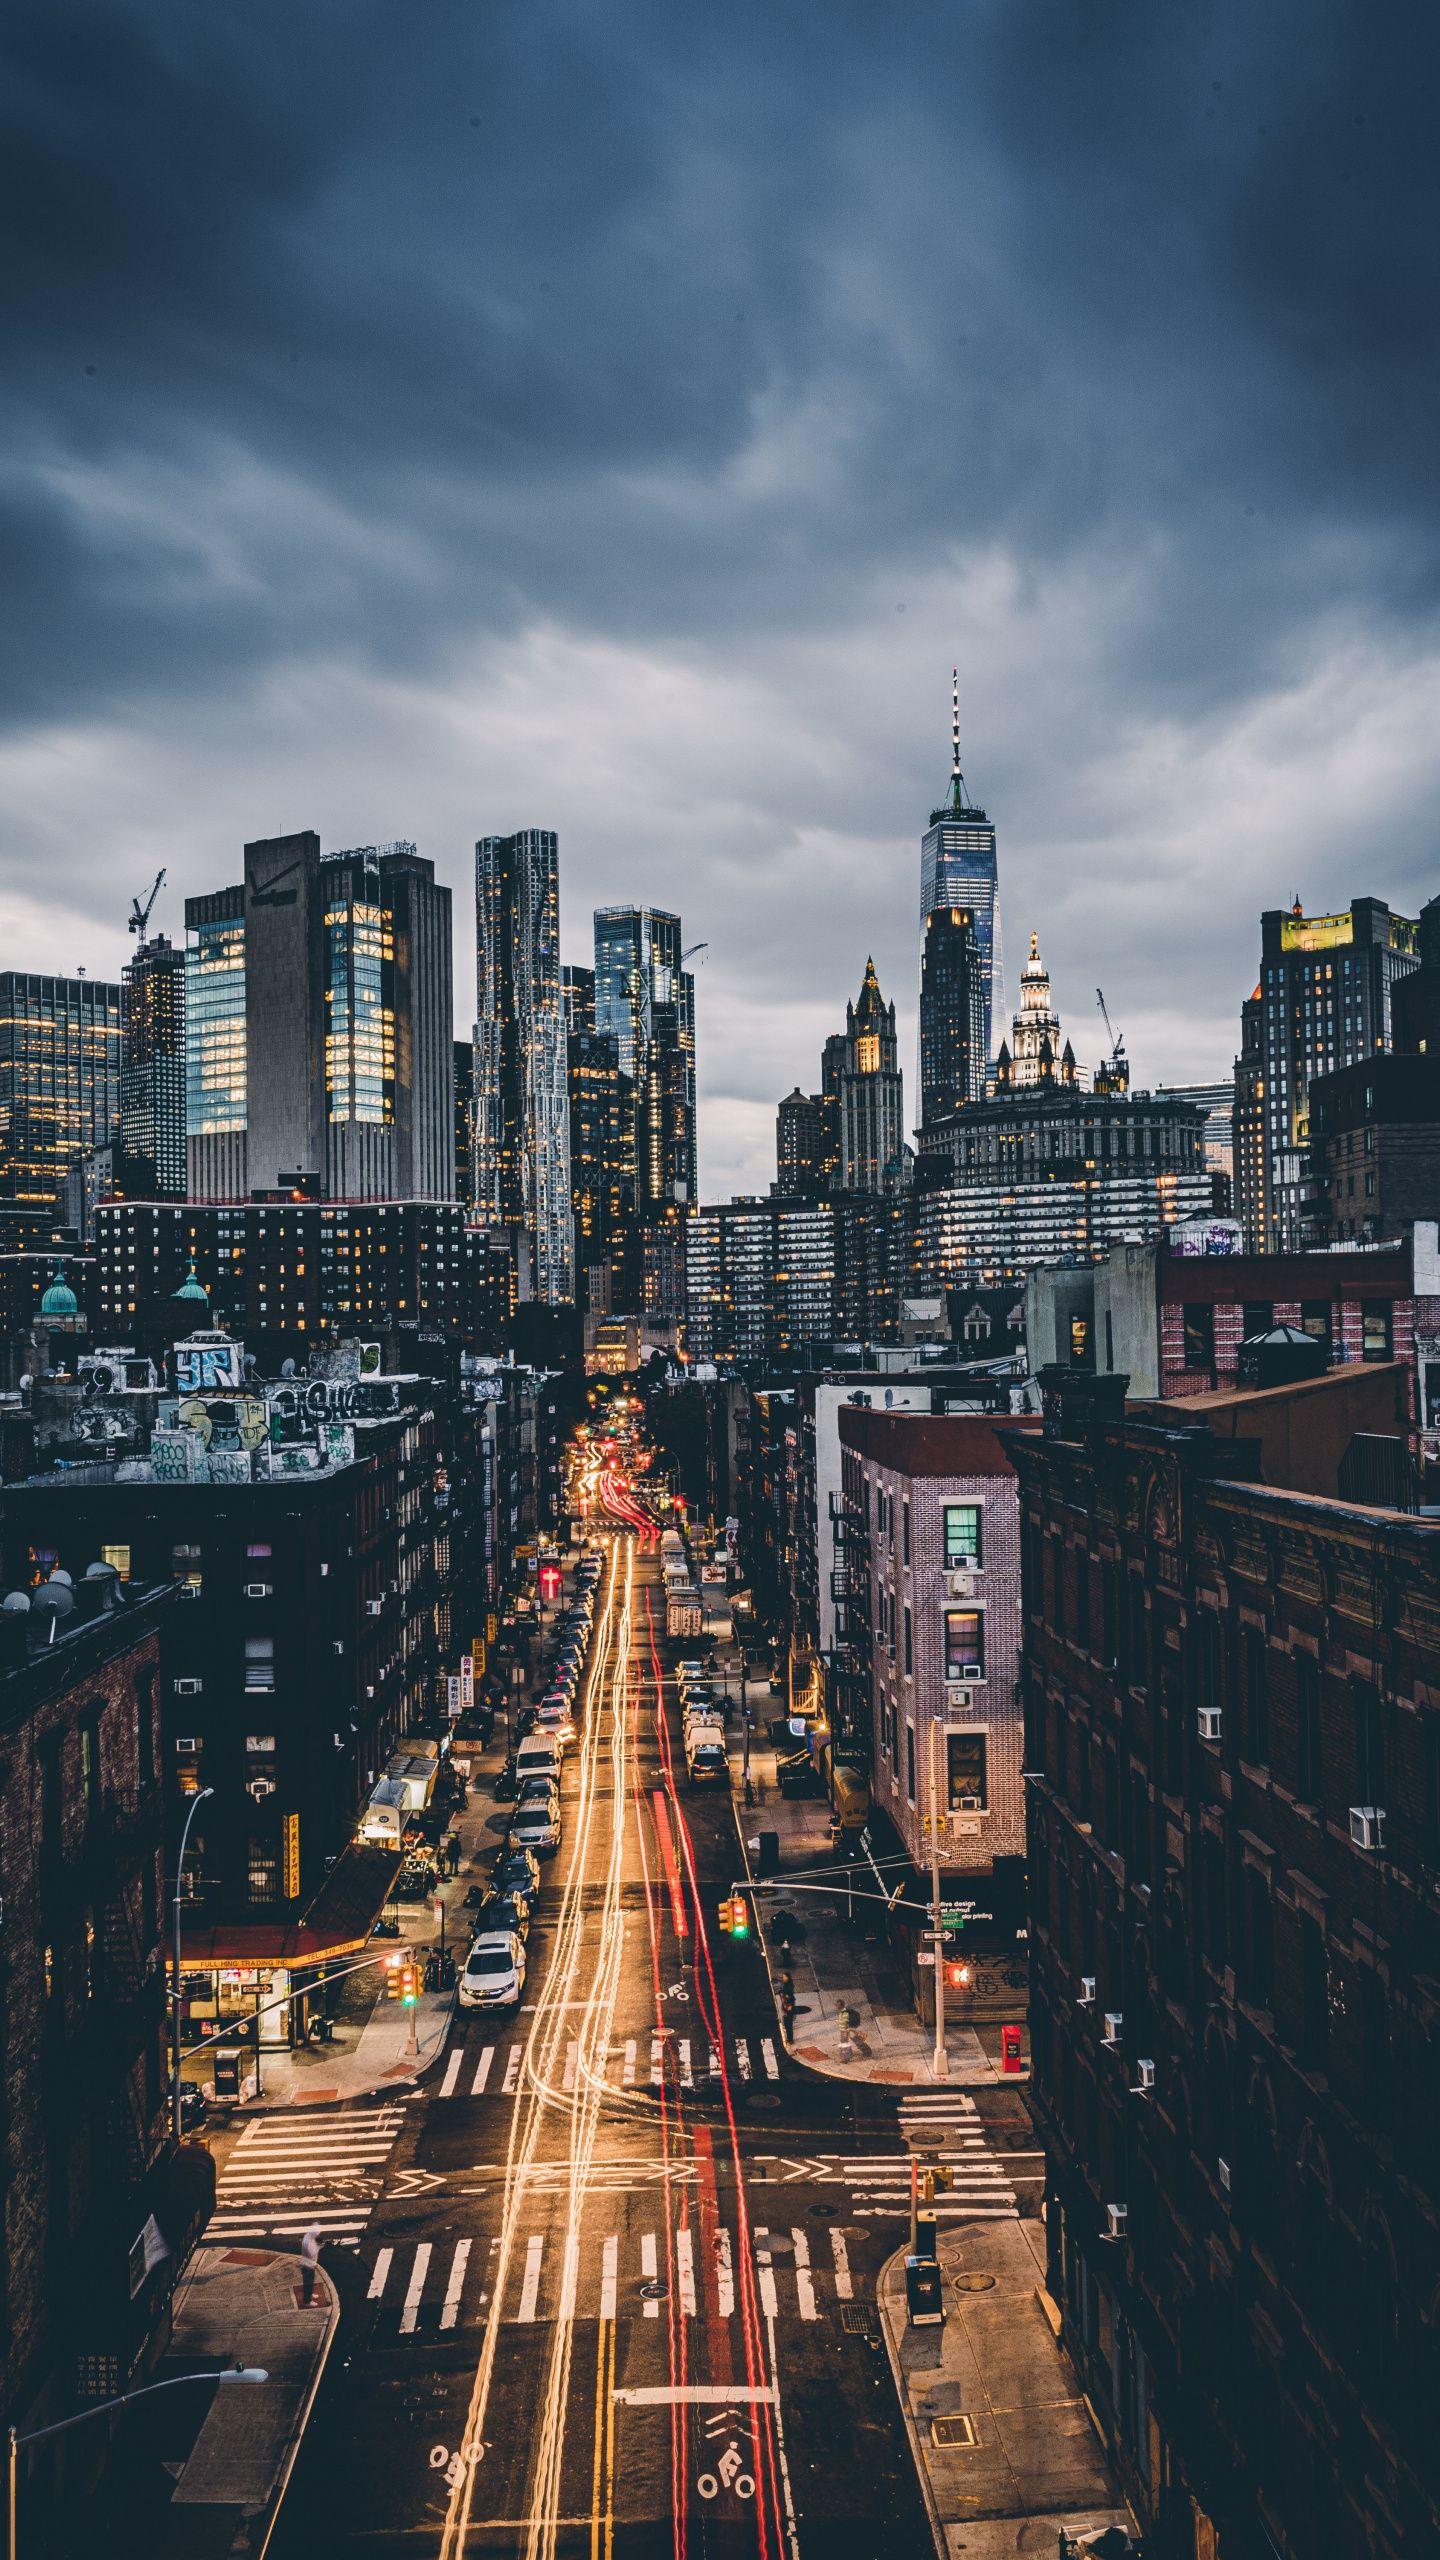 1440x2560 City Evening Skyscrapers Cityscape Wallpaper New York Wallpaper Cityscape Wallpaper City Wallpaper